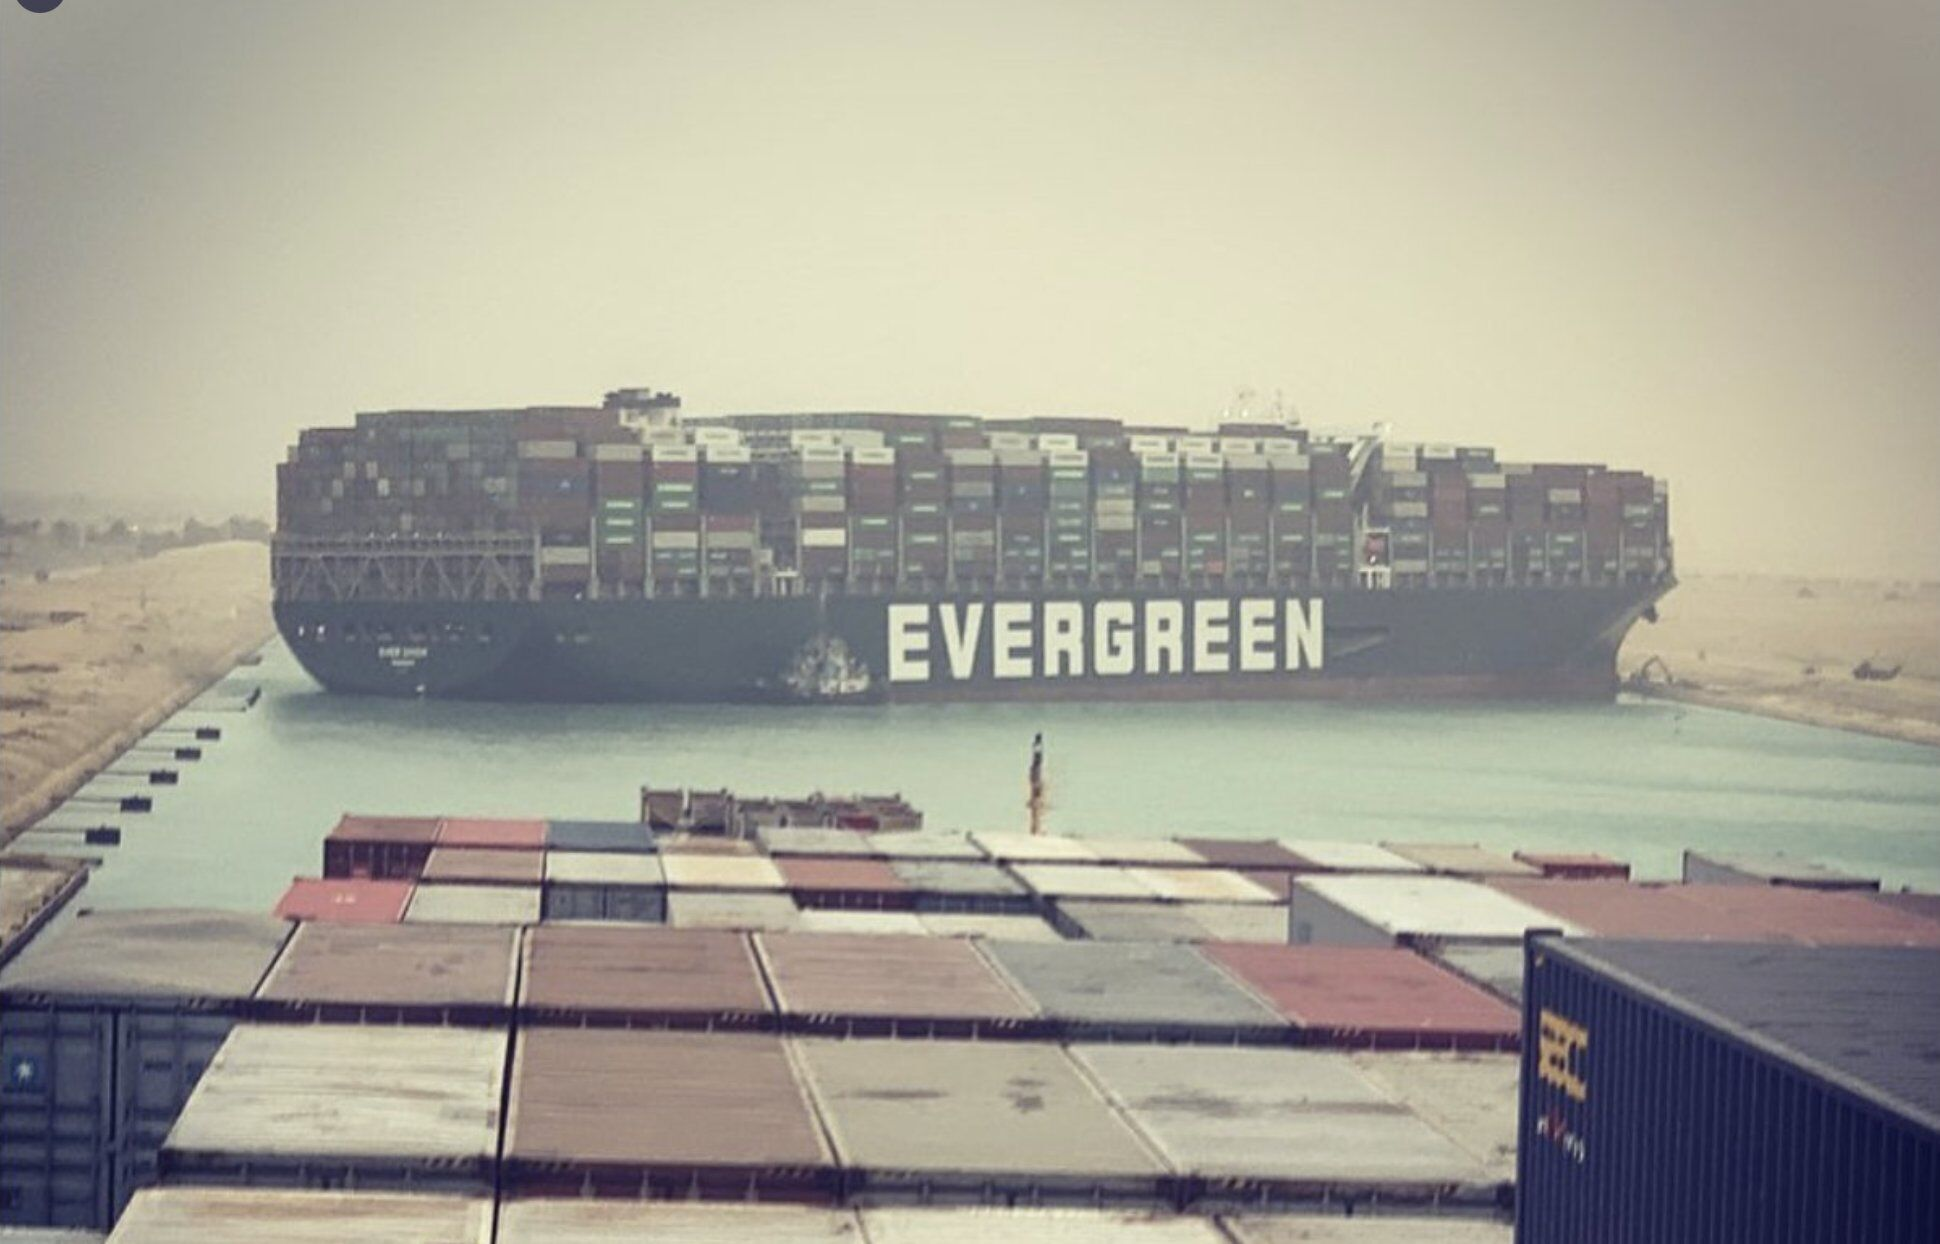 Судно Ever Given сіло на мілину в Суецькому каналі